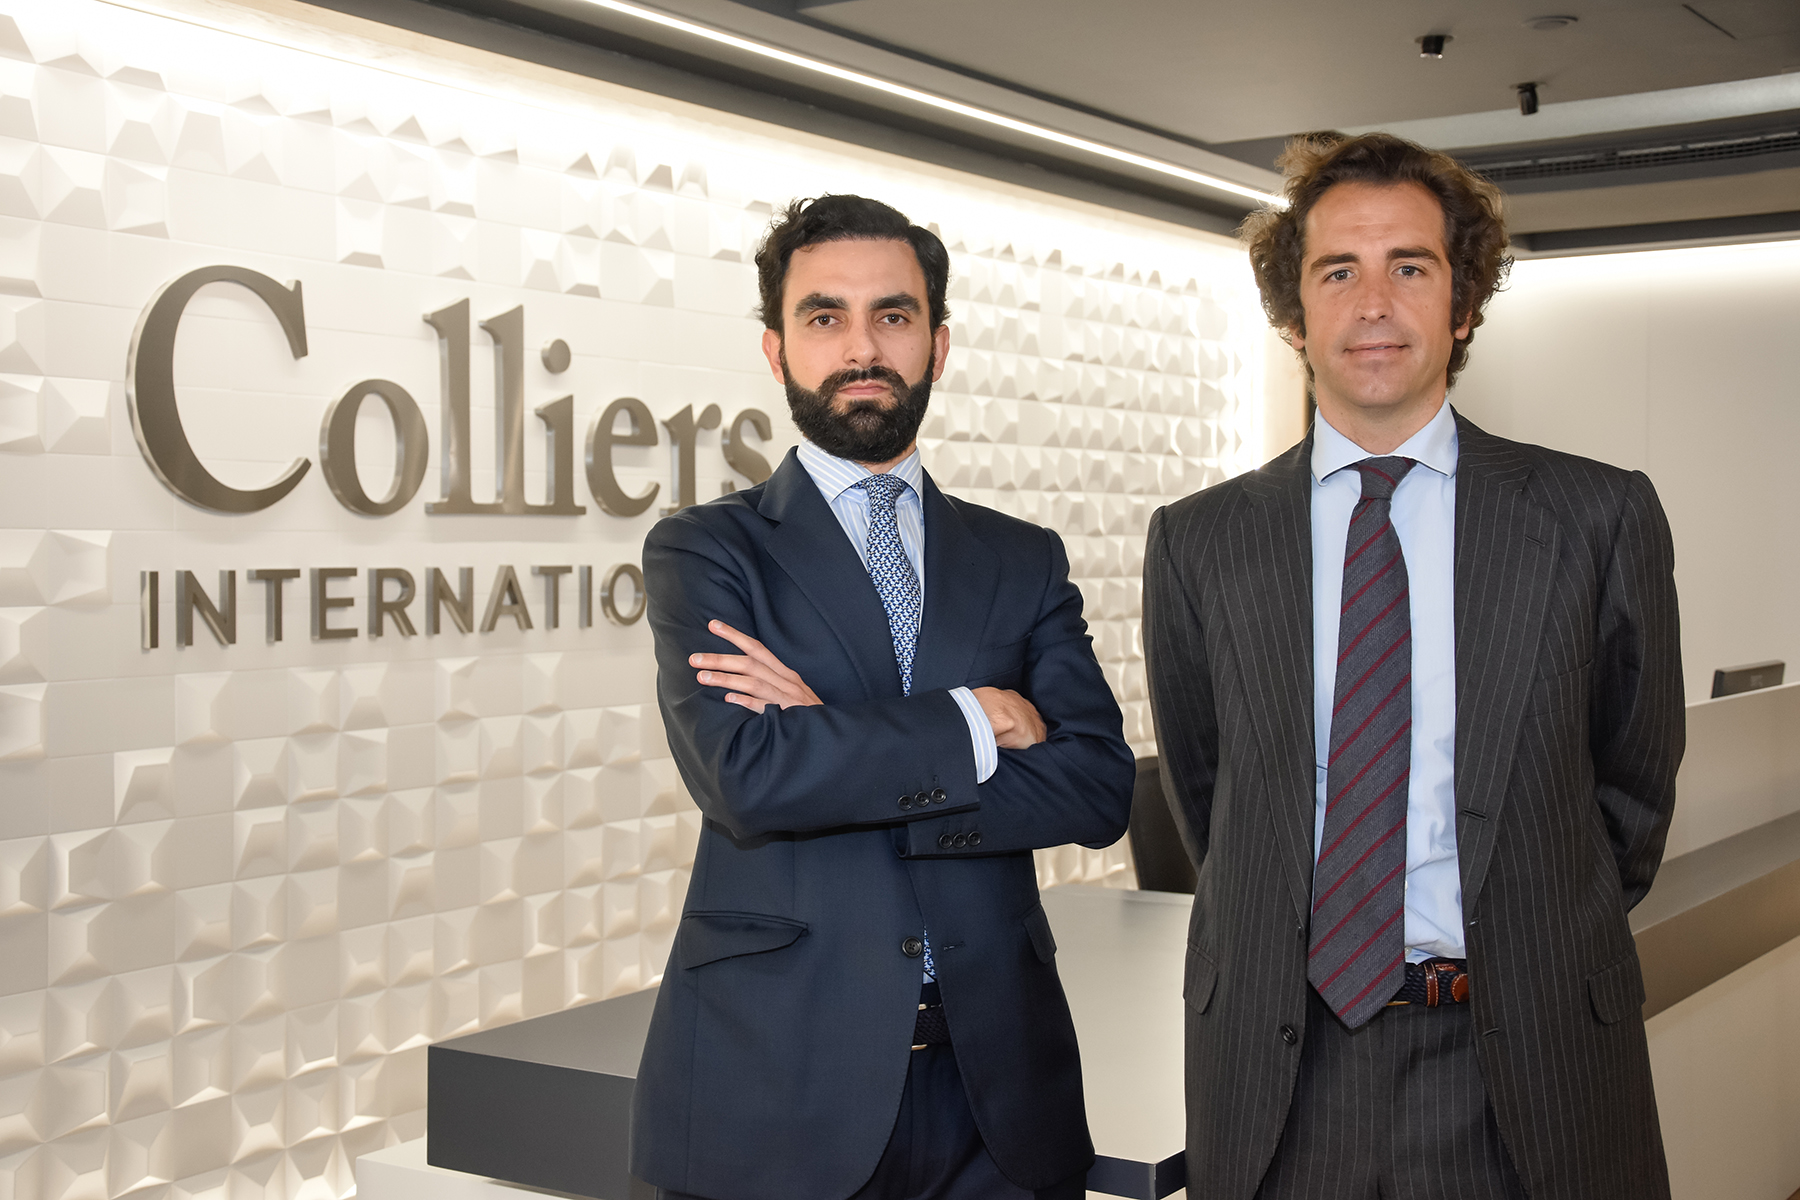 Borja Varela/ Colliers